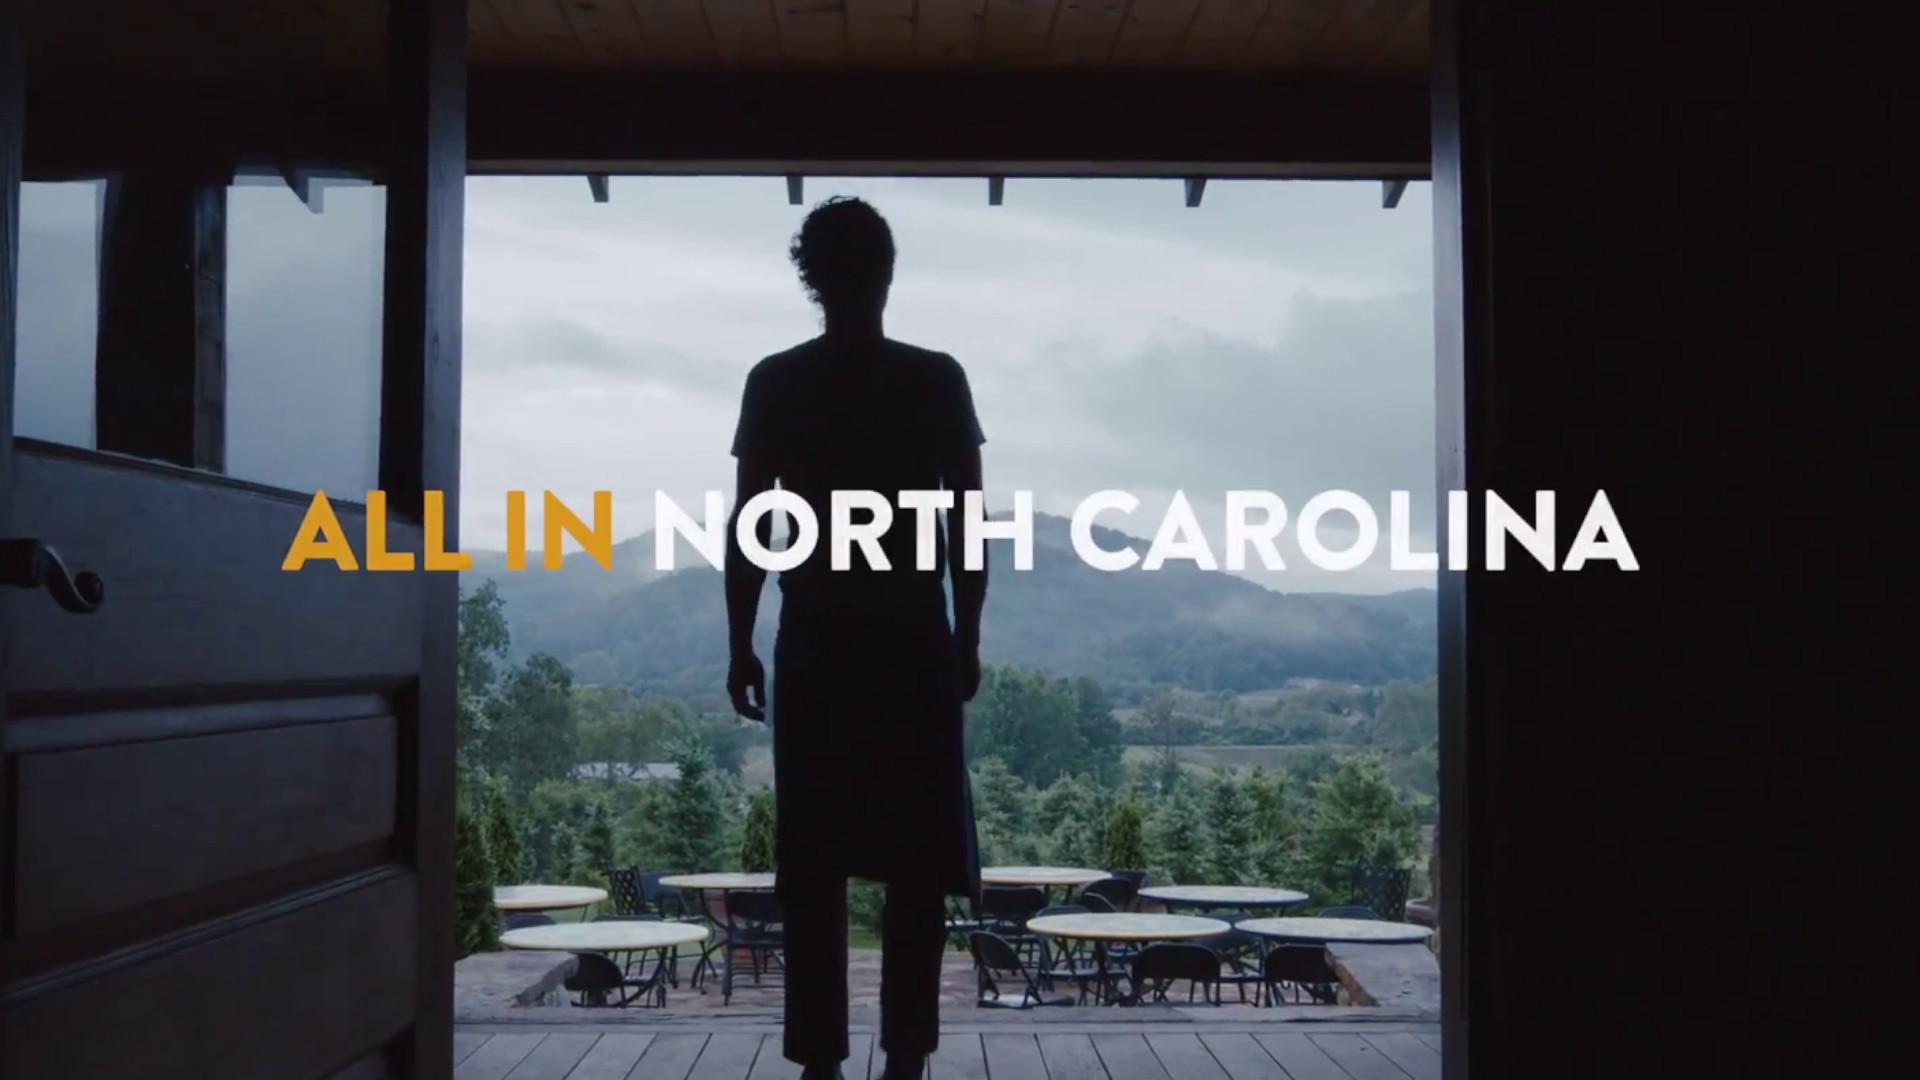 All In North Carolina by Economic Development Partnership of North Carolina